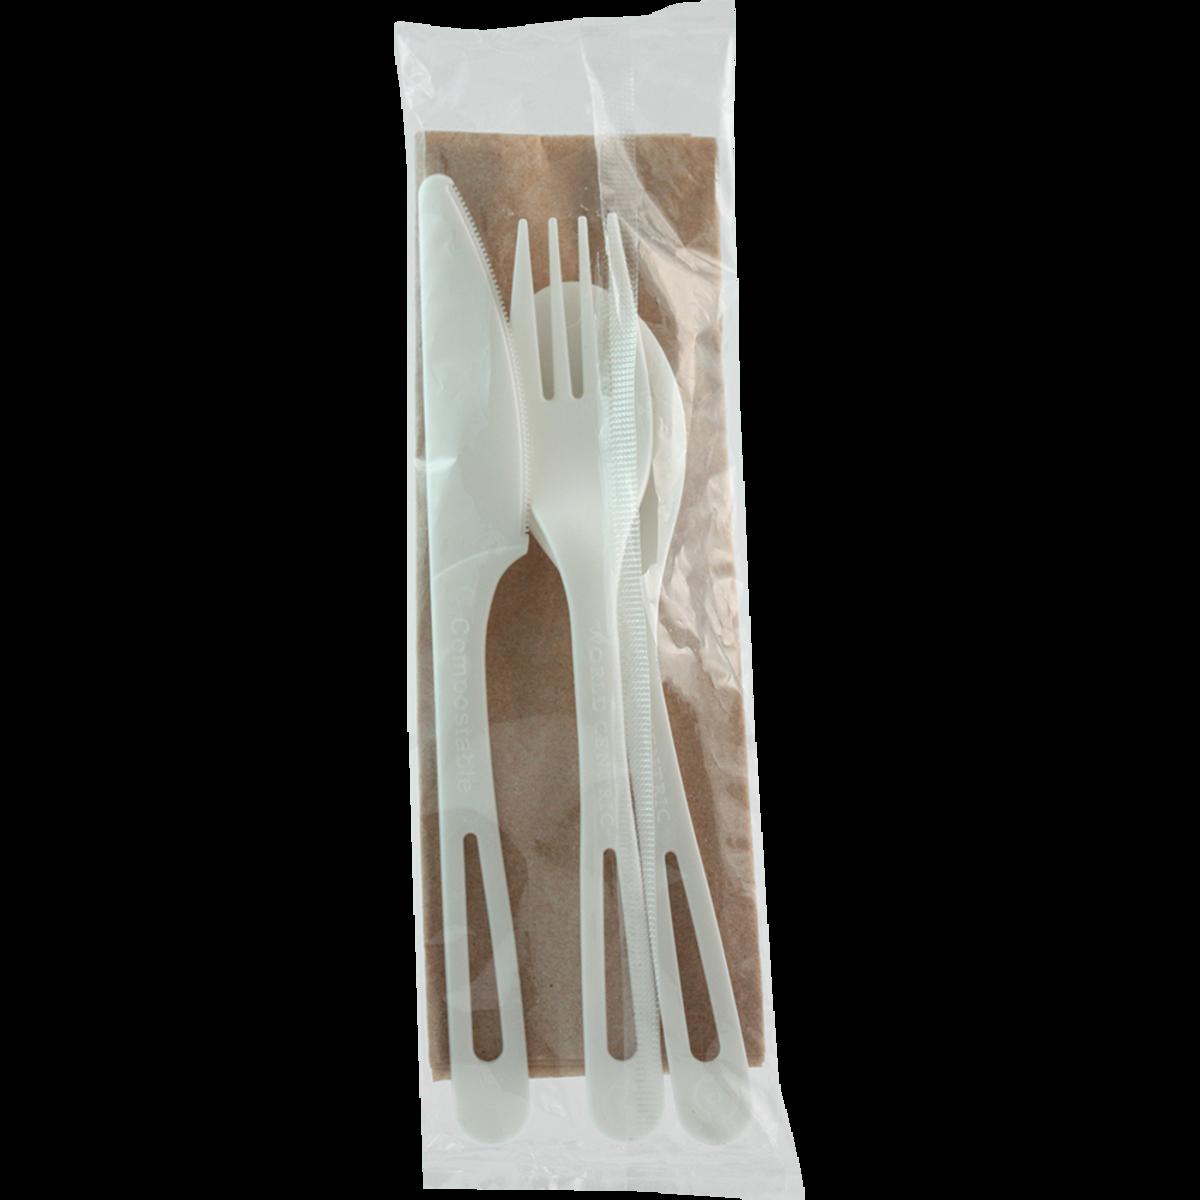 "WCT White Compostable Medium-Hvy Wt. 6"" F/K/S Napkin Kit AS-PS-TN 250ct"